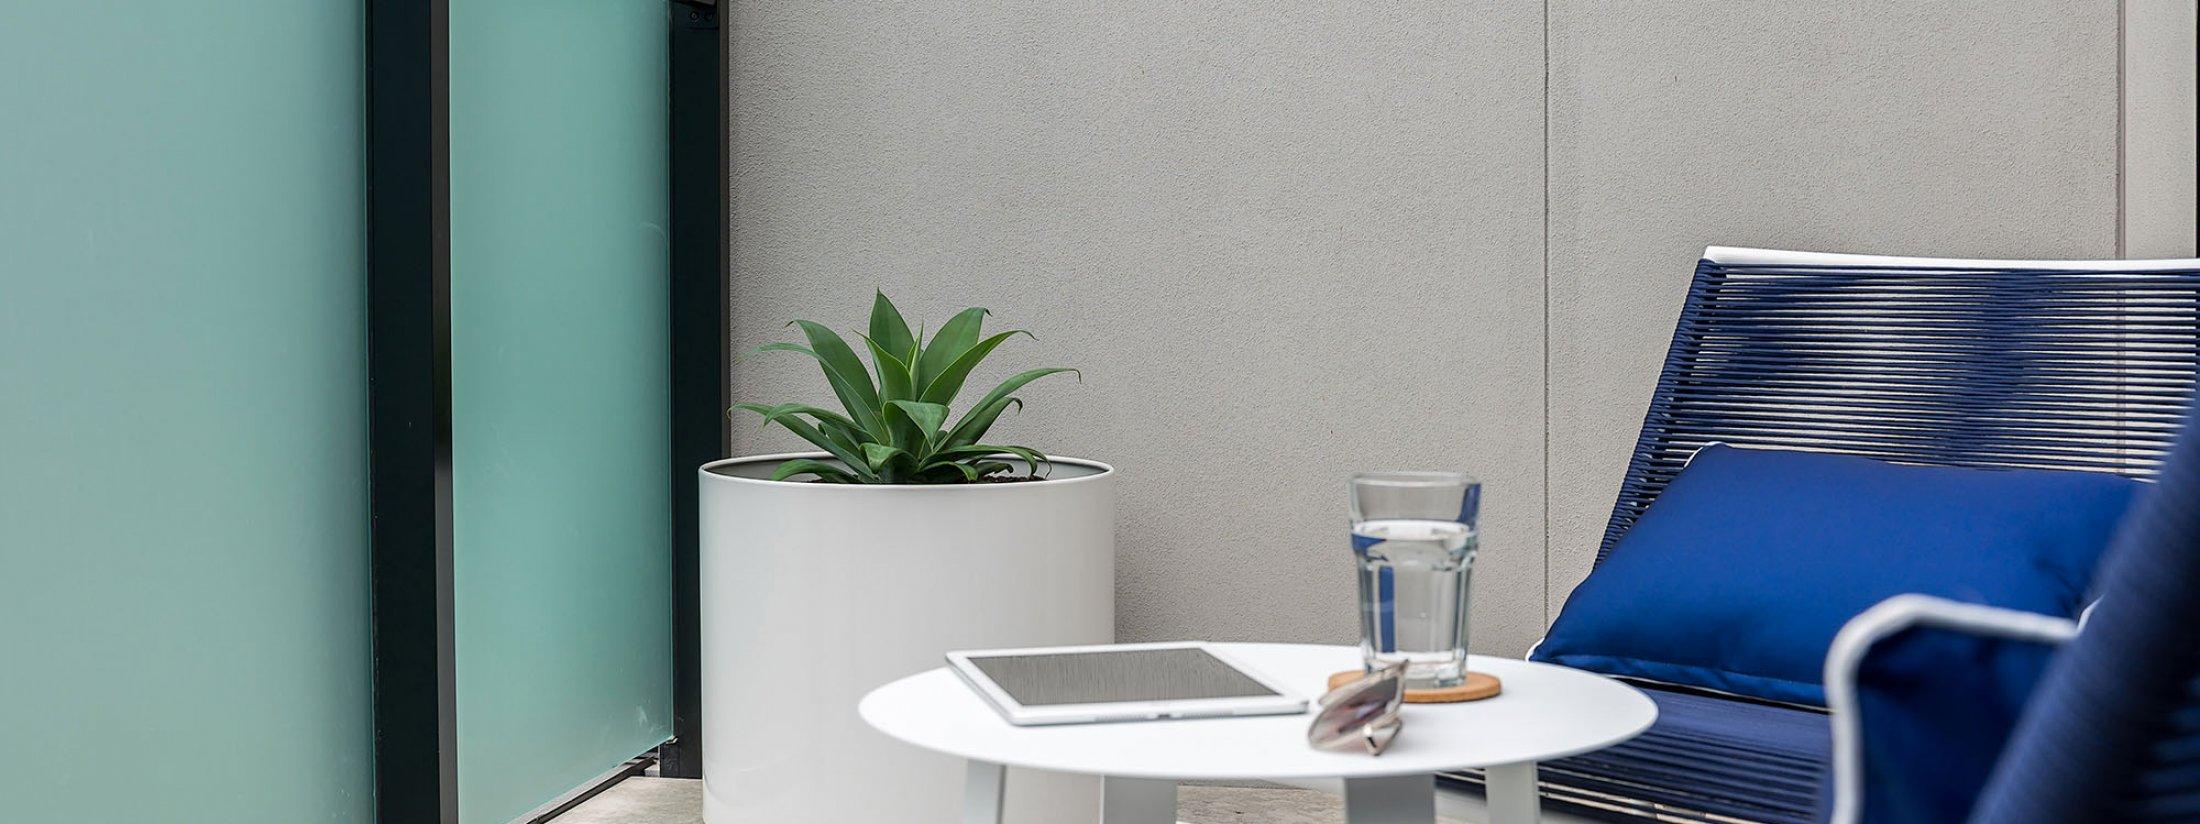 Axel Apartments - The Radnor - Glen Iris - Balcony